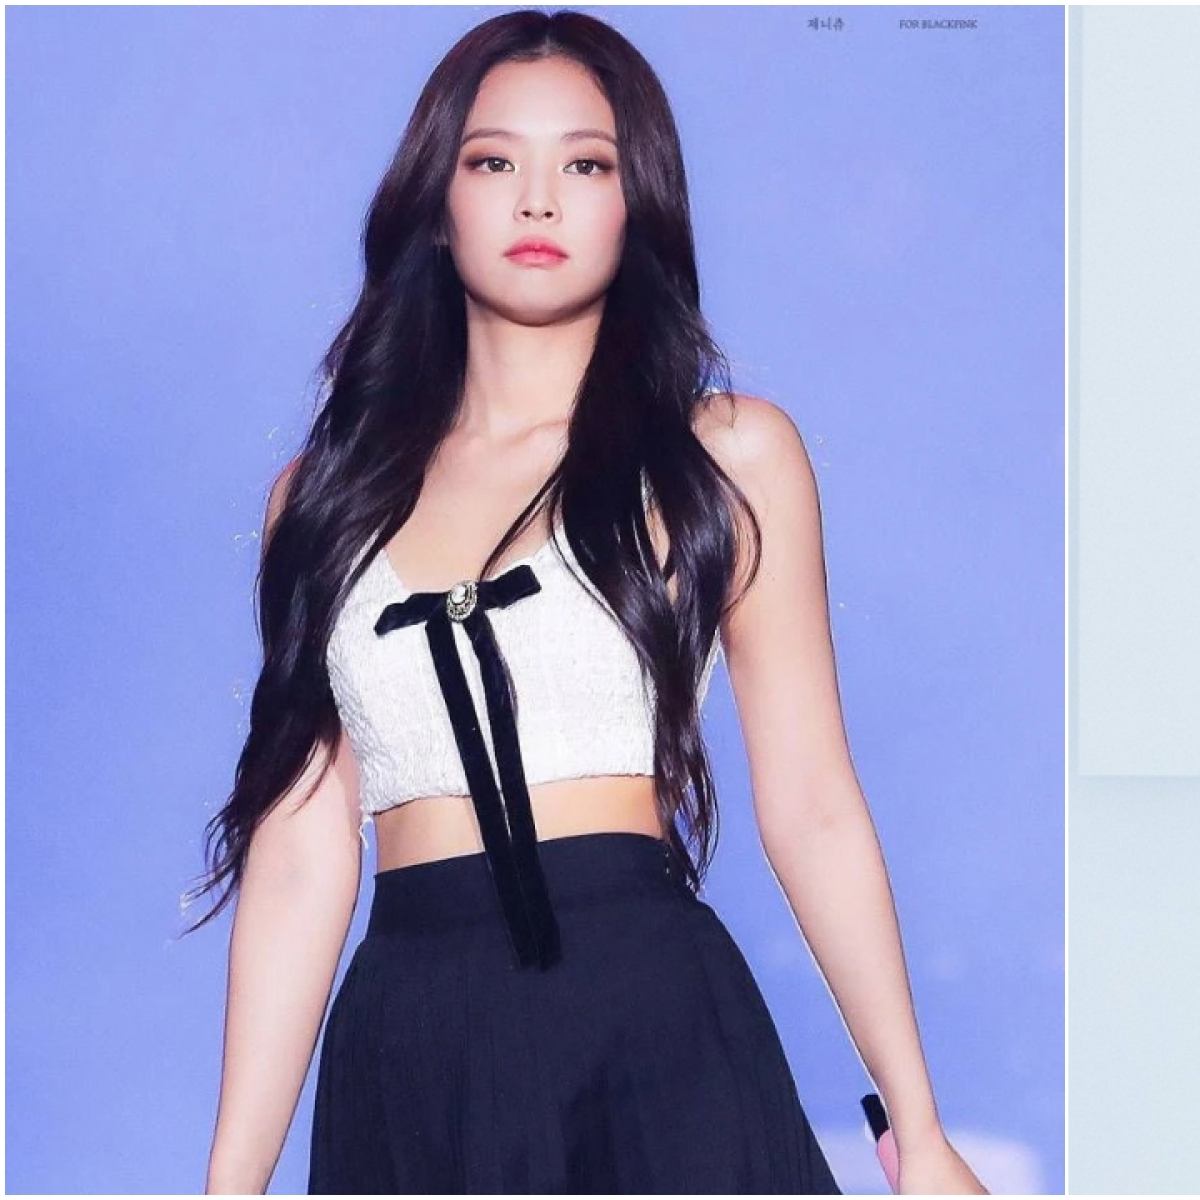 Who is Jennie, Blackpink's K-Pop star dating Big Bang's G-Dragon?